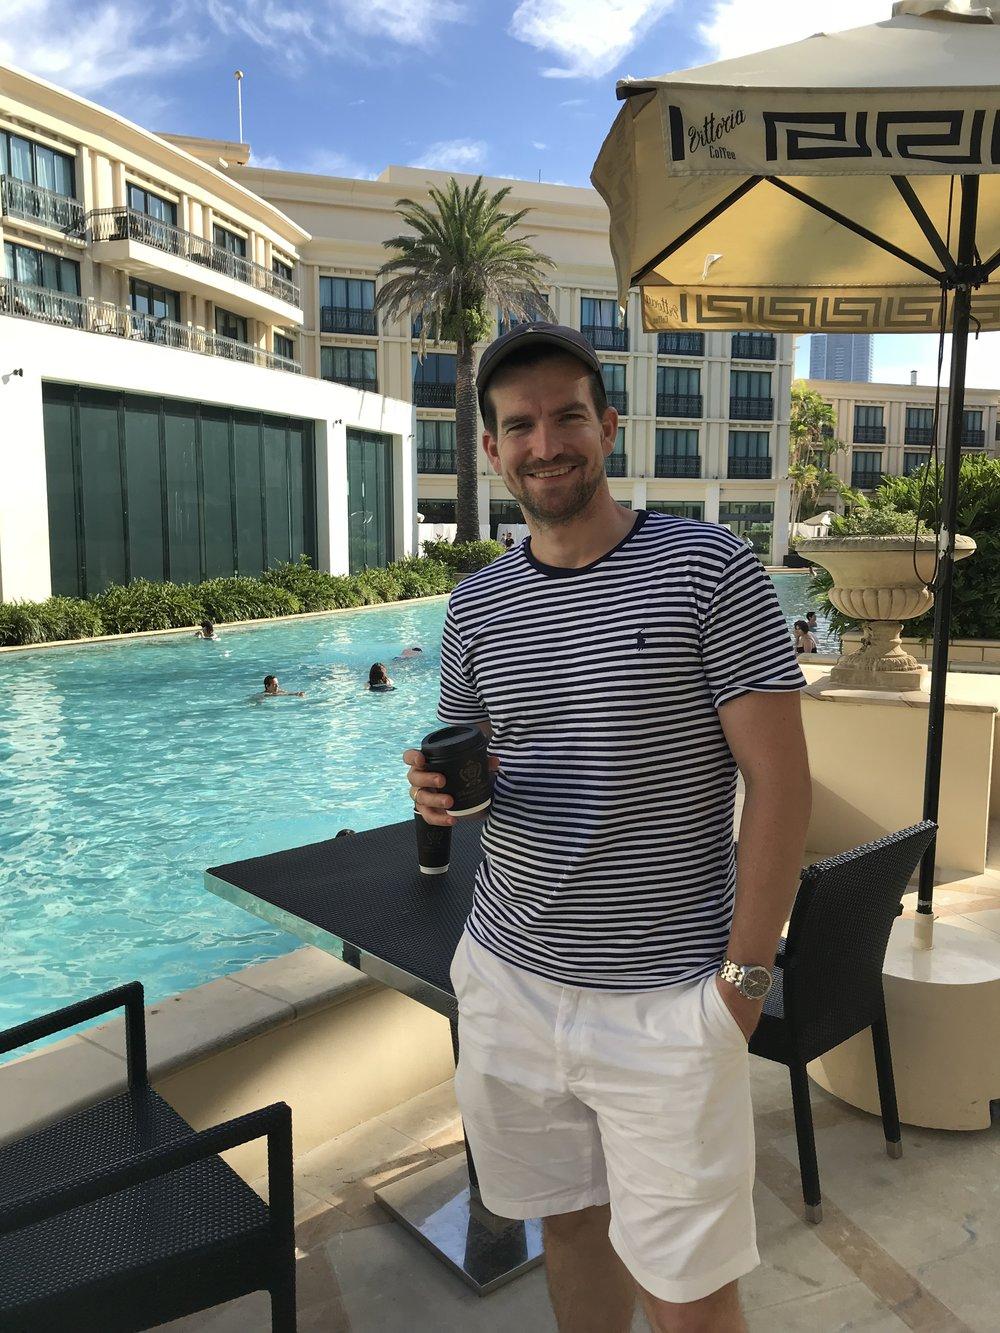 The handsome husband!